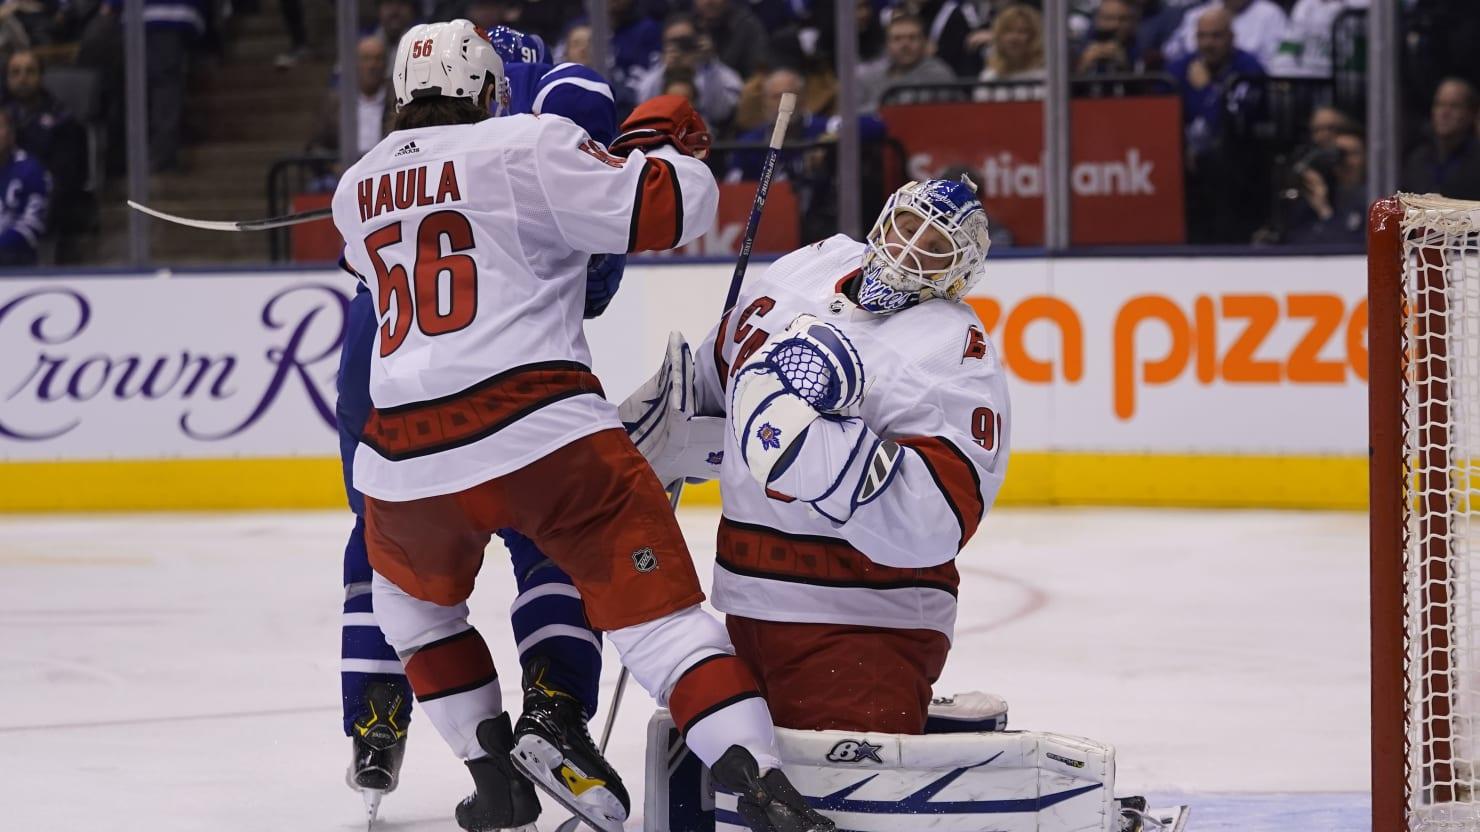 Zamboni Driver Leads NHL's Hurricanes to Victory as Emergency Goalie